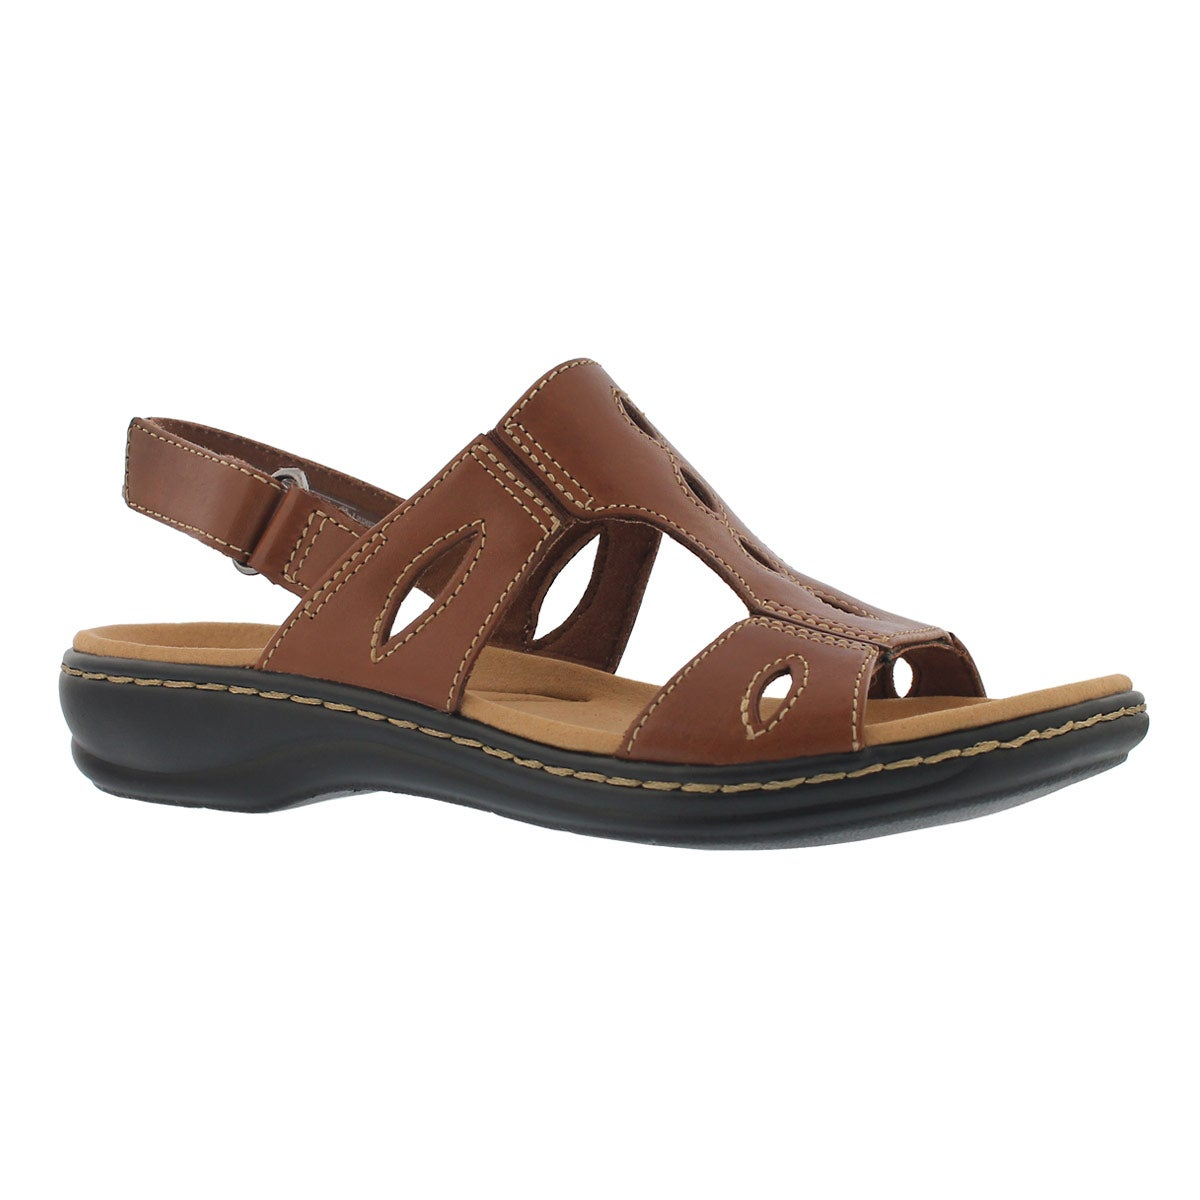 Women's LEISA LAKELYN tan casual sandals